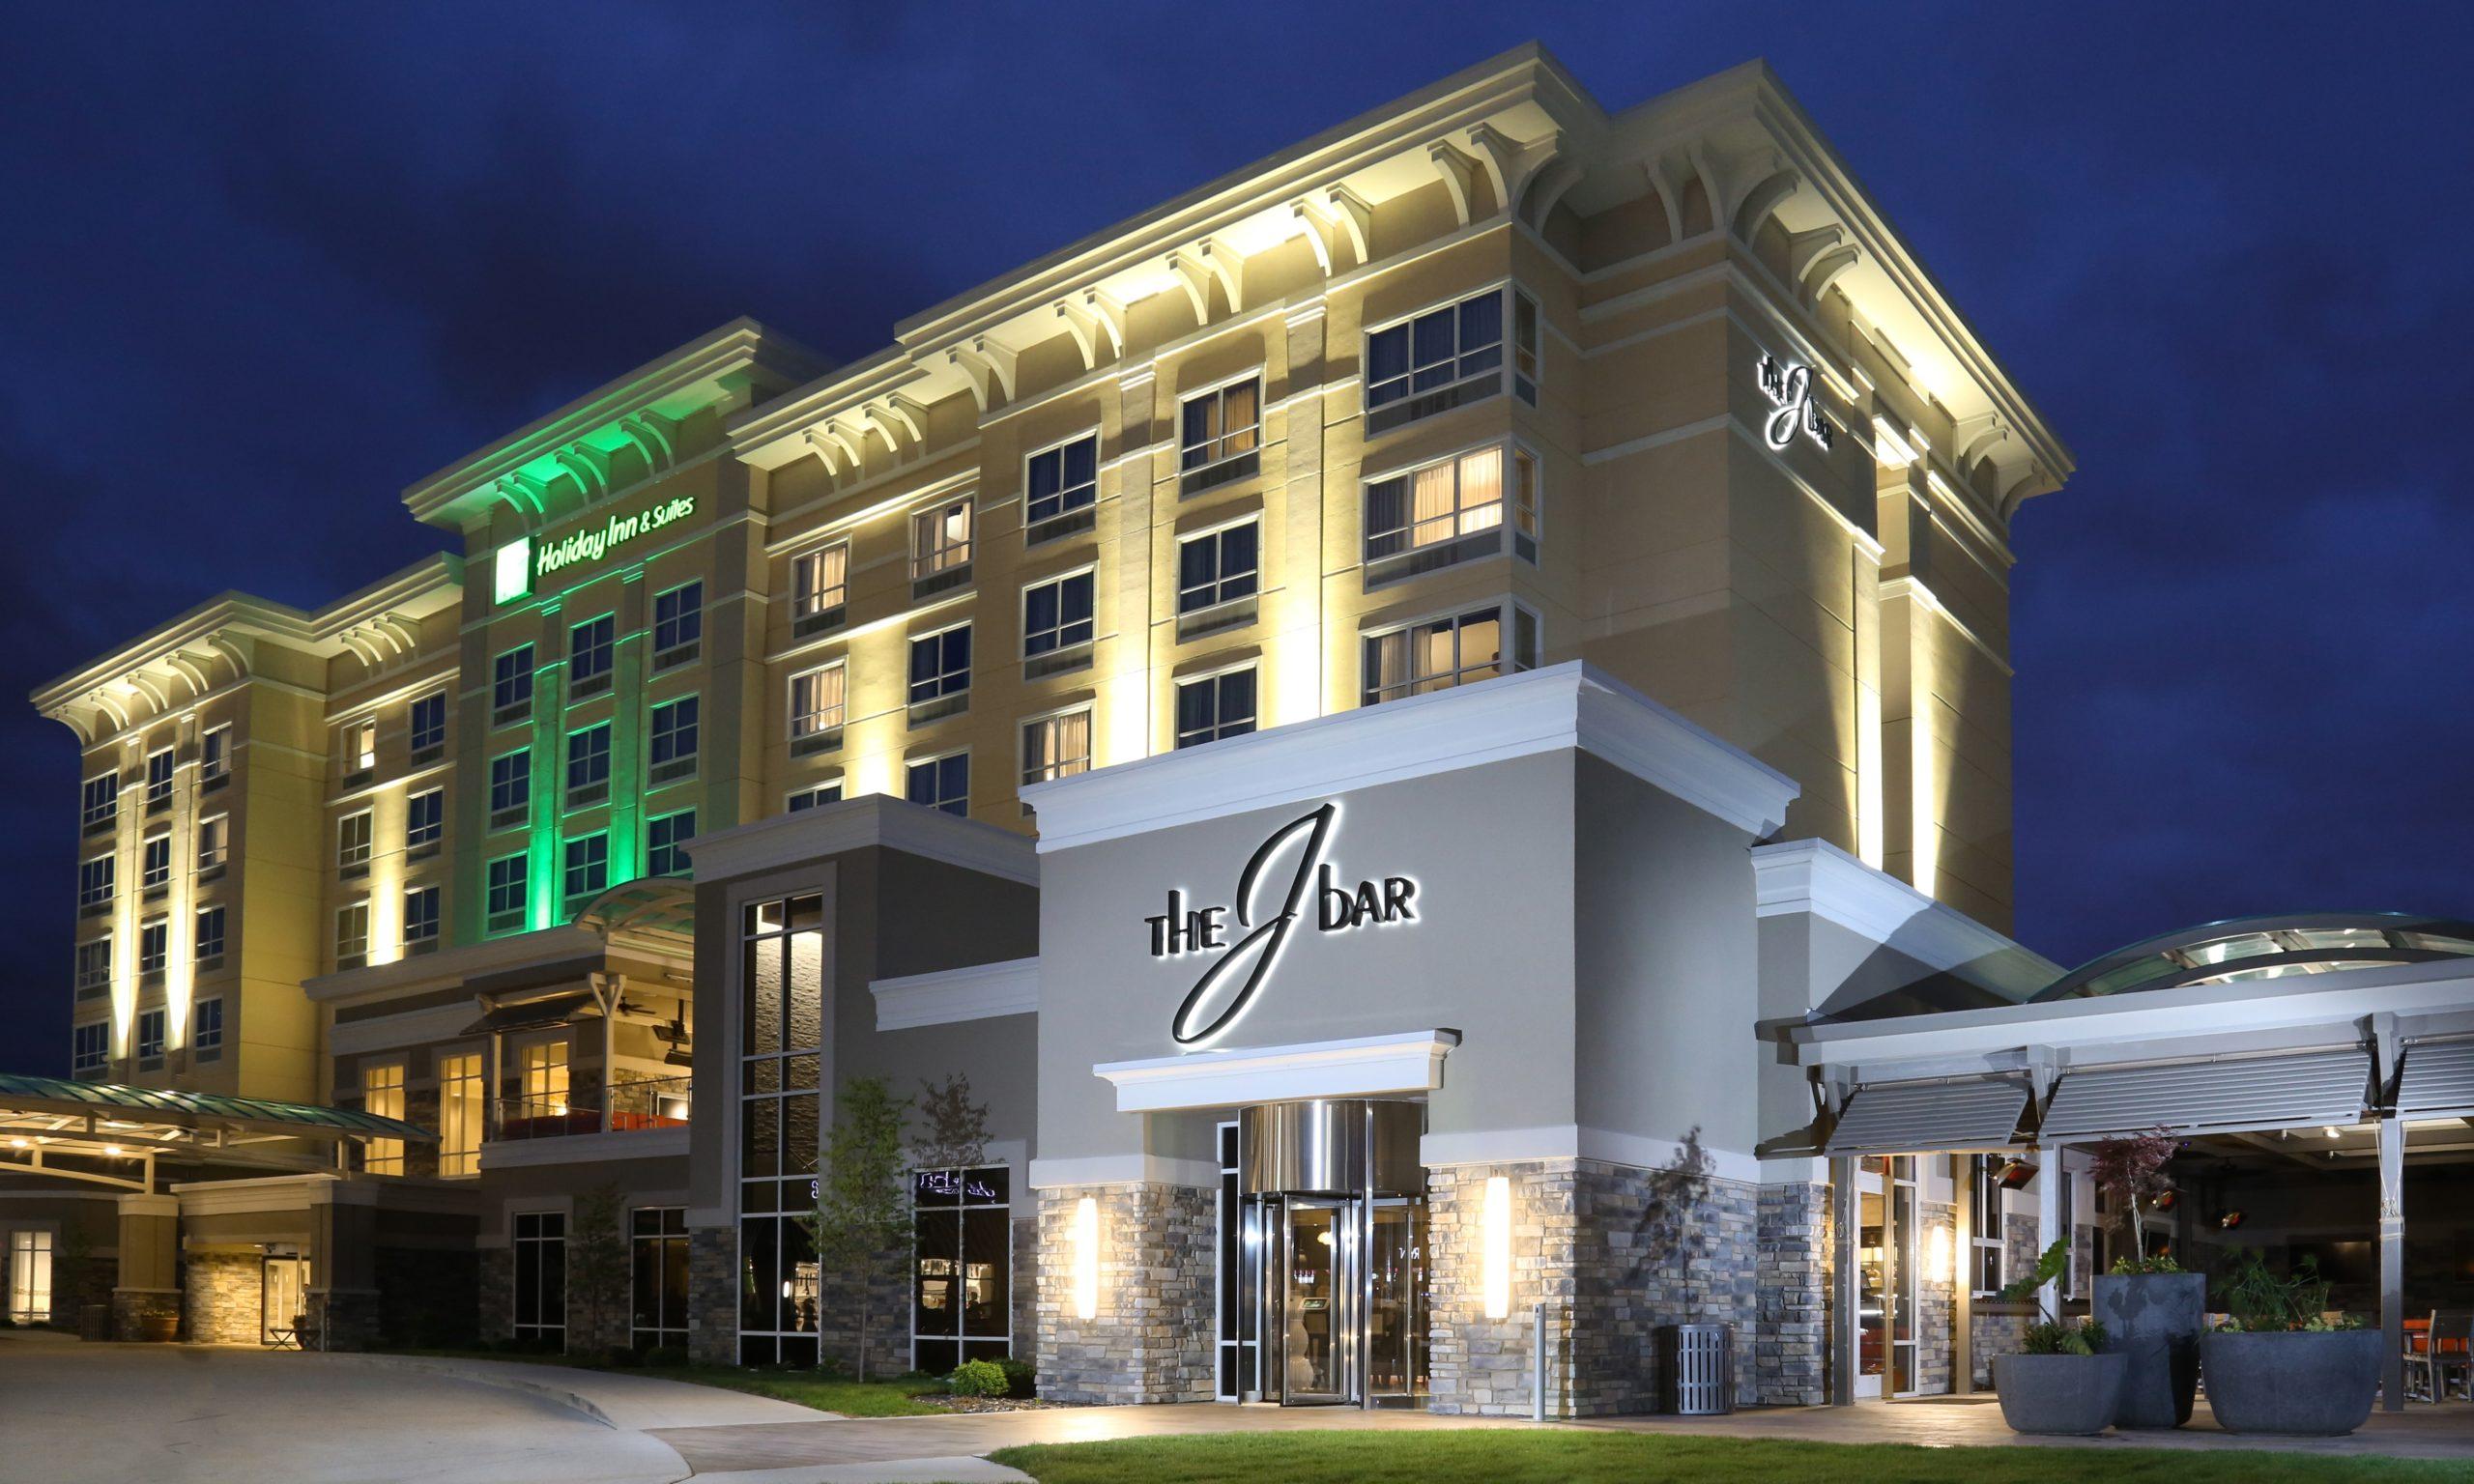 Holiday Inn J-Bar Davenport